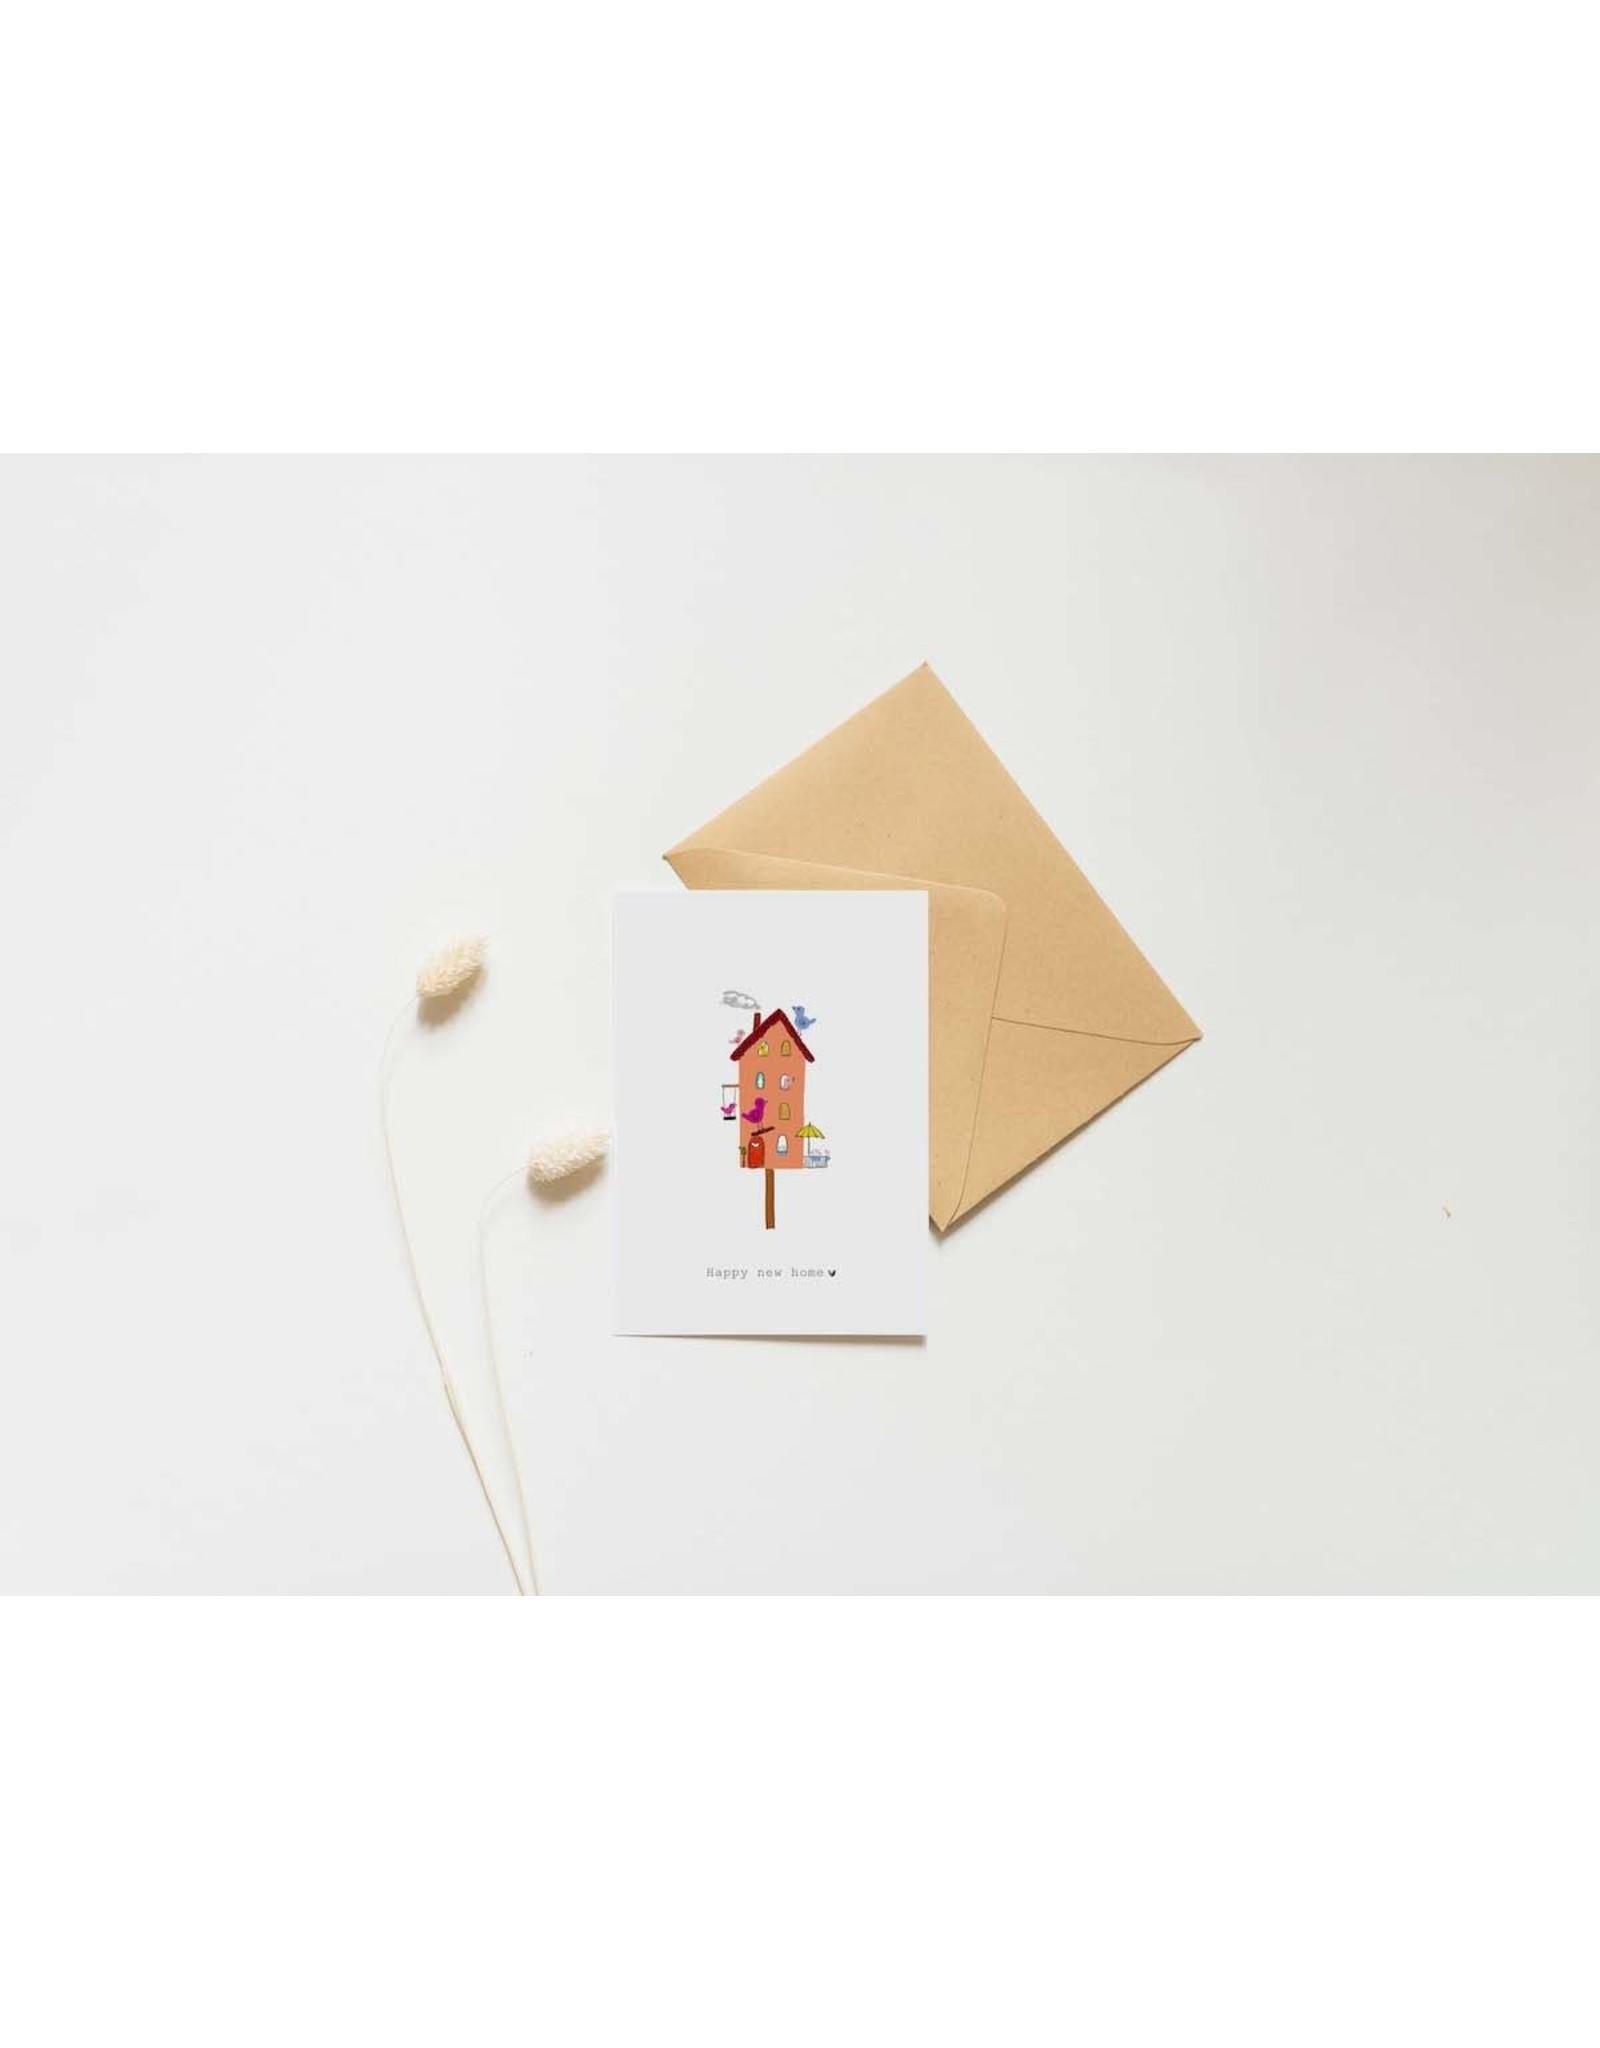 Nadine illustraties Wenskaart - Vogelhuisje Happy new house - Dubbele Kaart met envelop - blanco